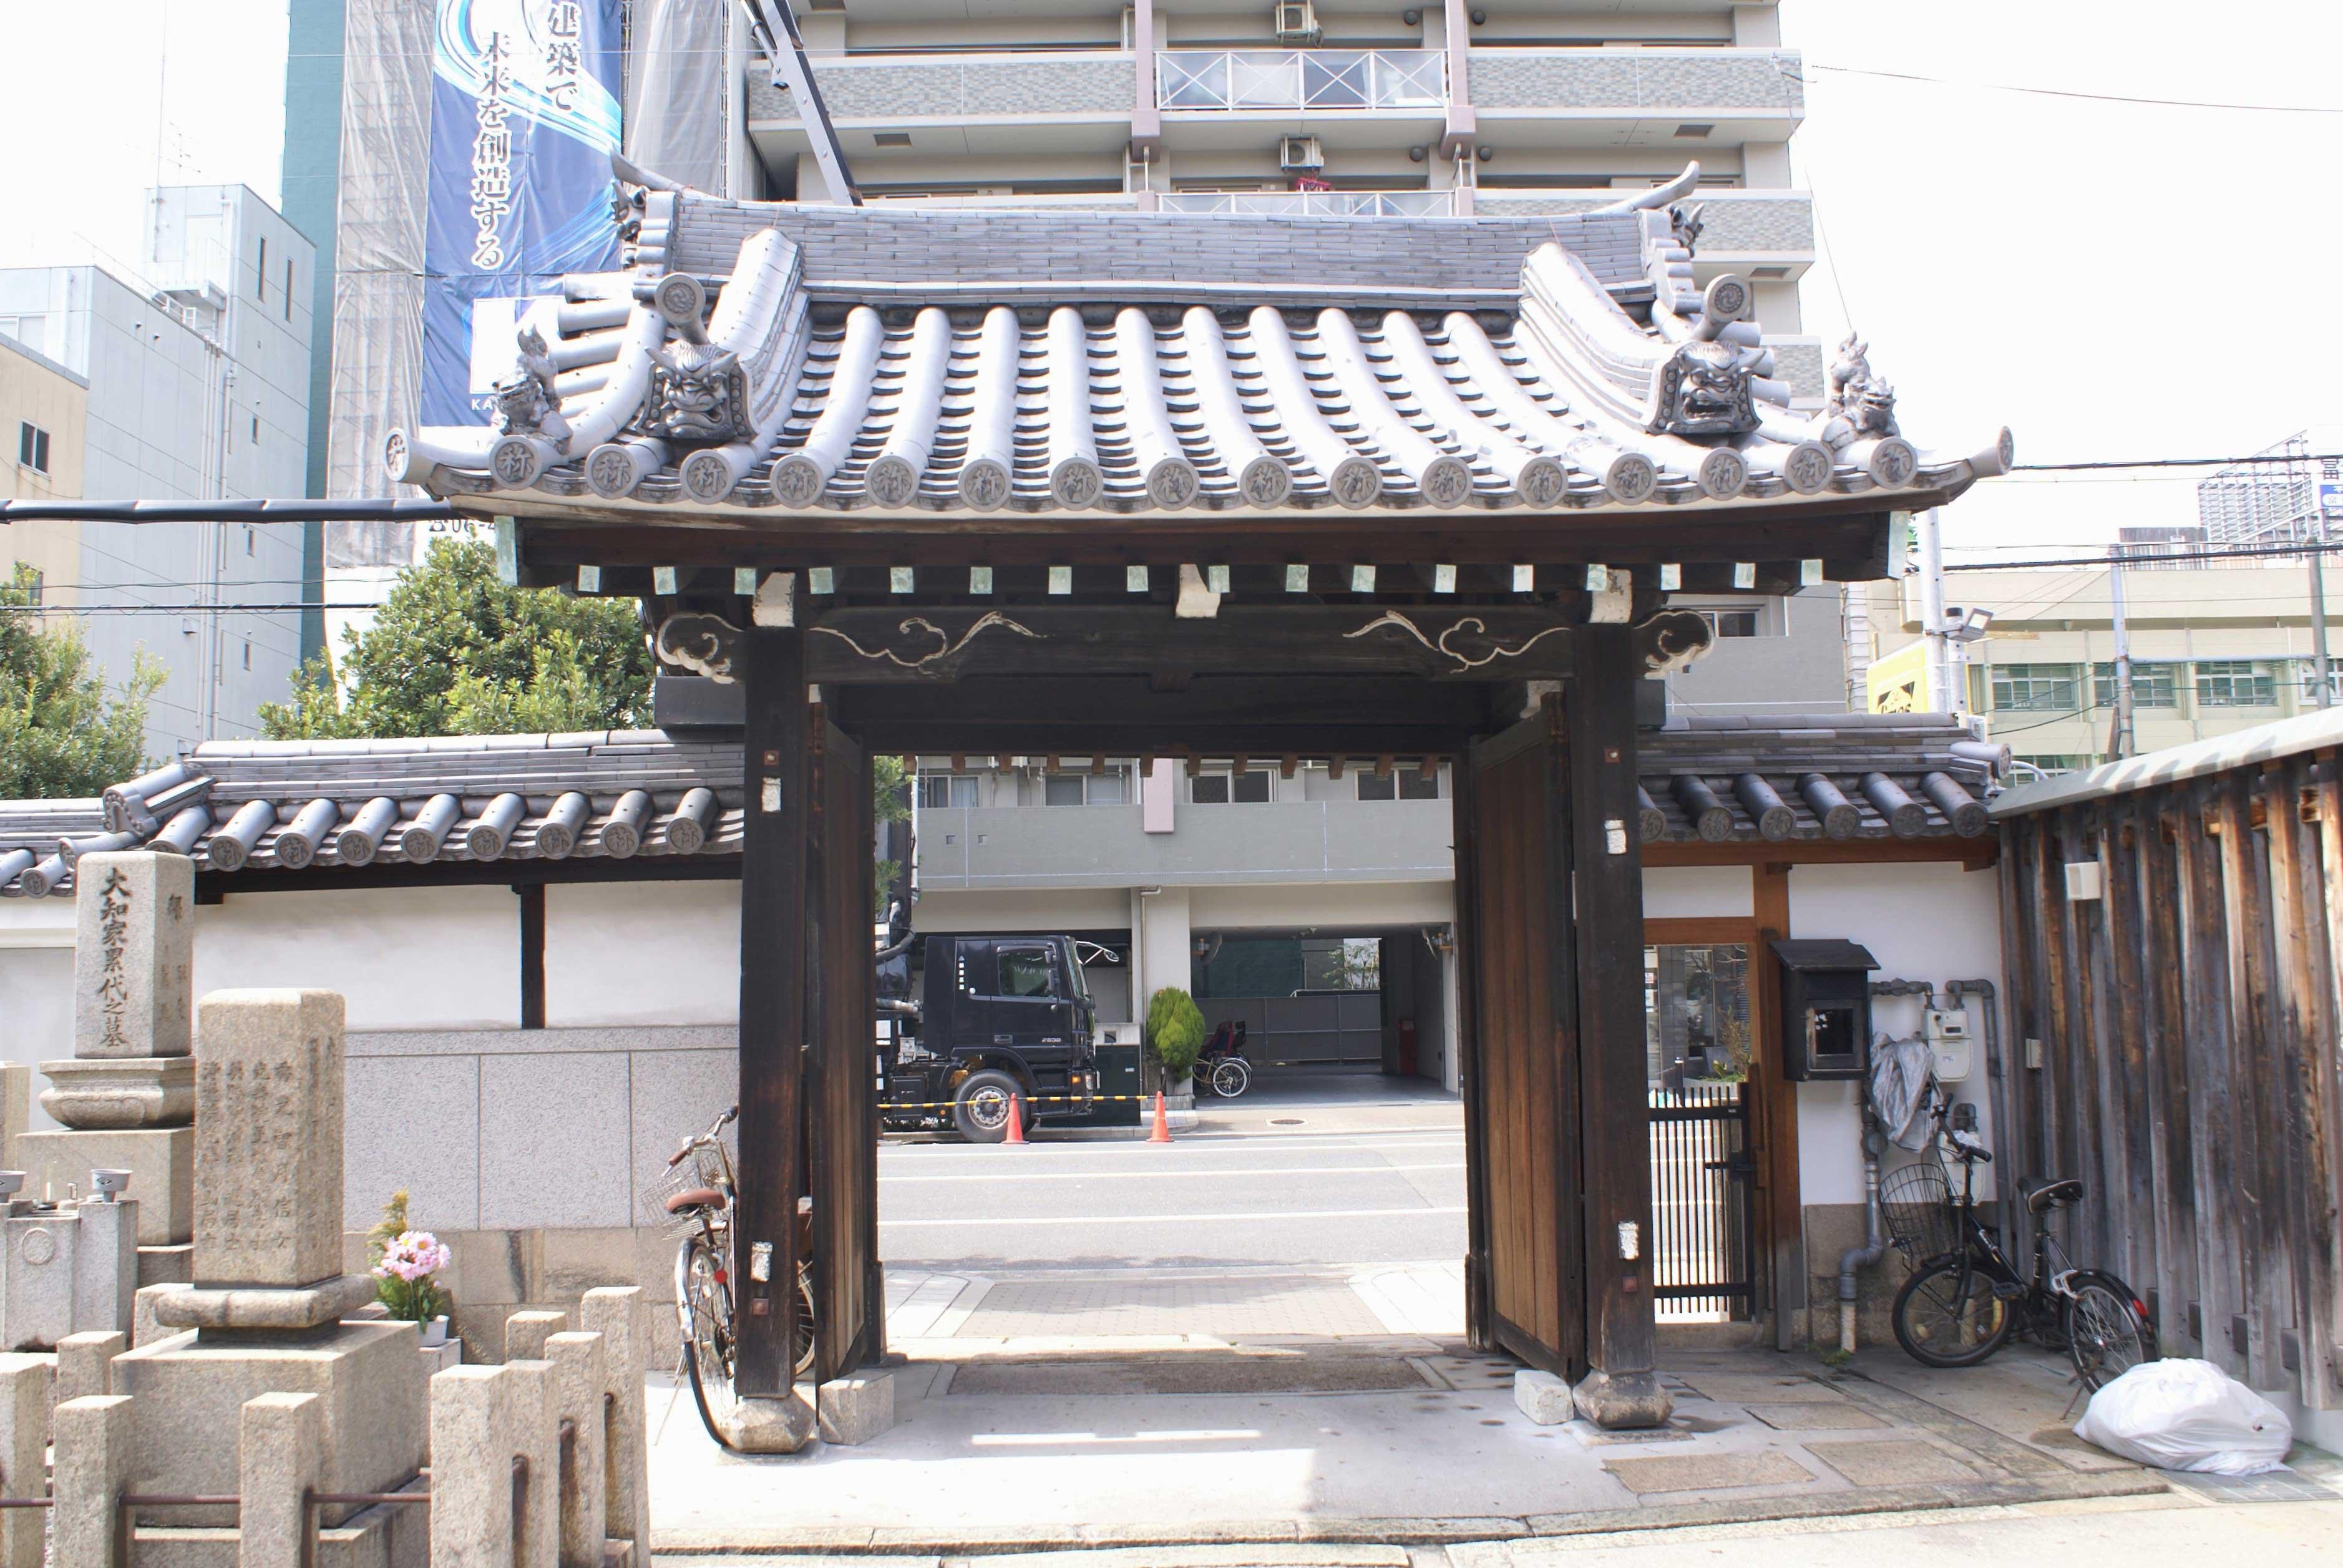 <p>境内内部から山門をみる</p>装飾を抑えるが、木鼻など細部に、江戸中期らしい意匠を示す